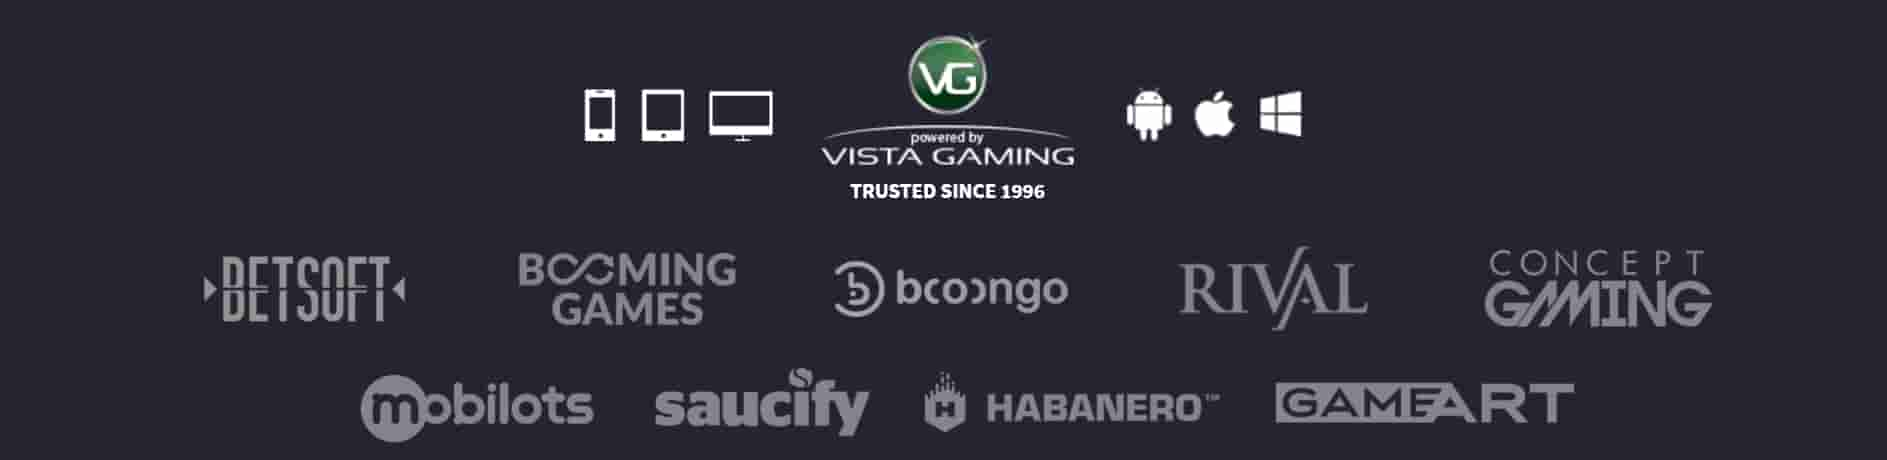 vegas crest developers